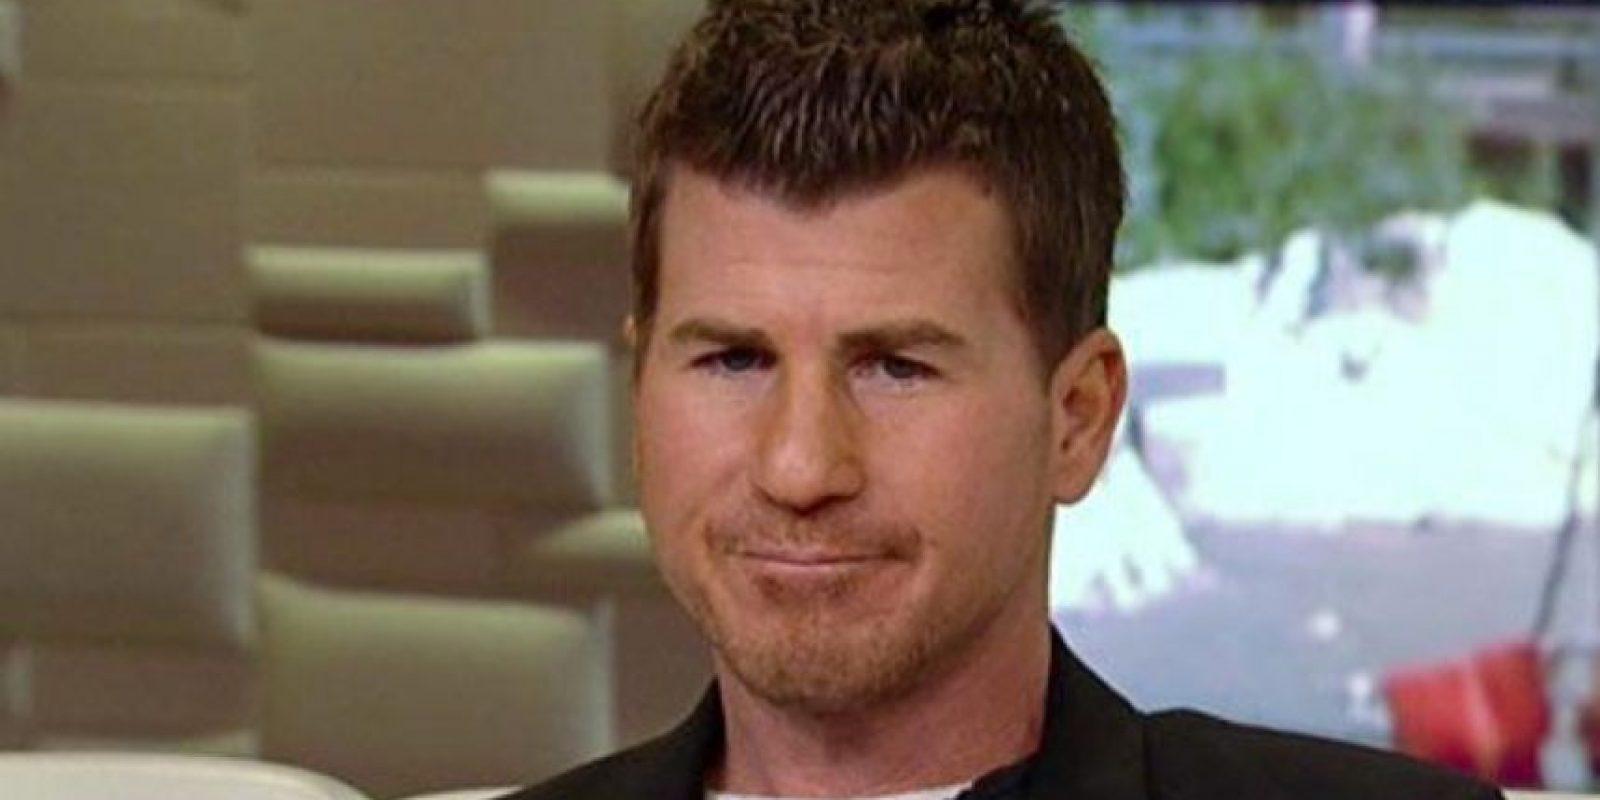 Para variar, participó en realities basura de VH1. Foto:vía Fox News